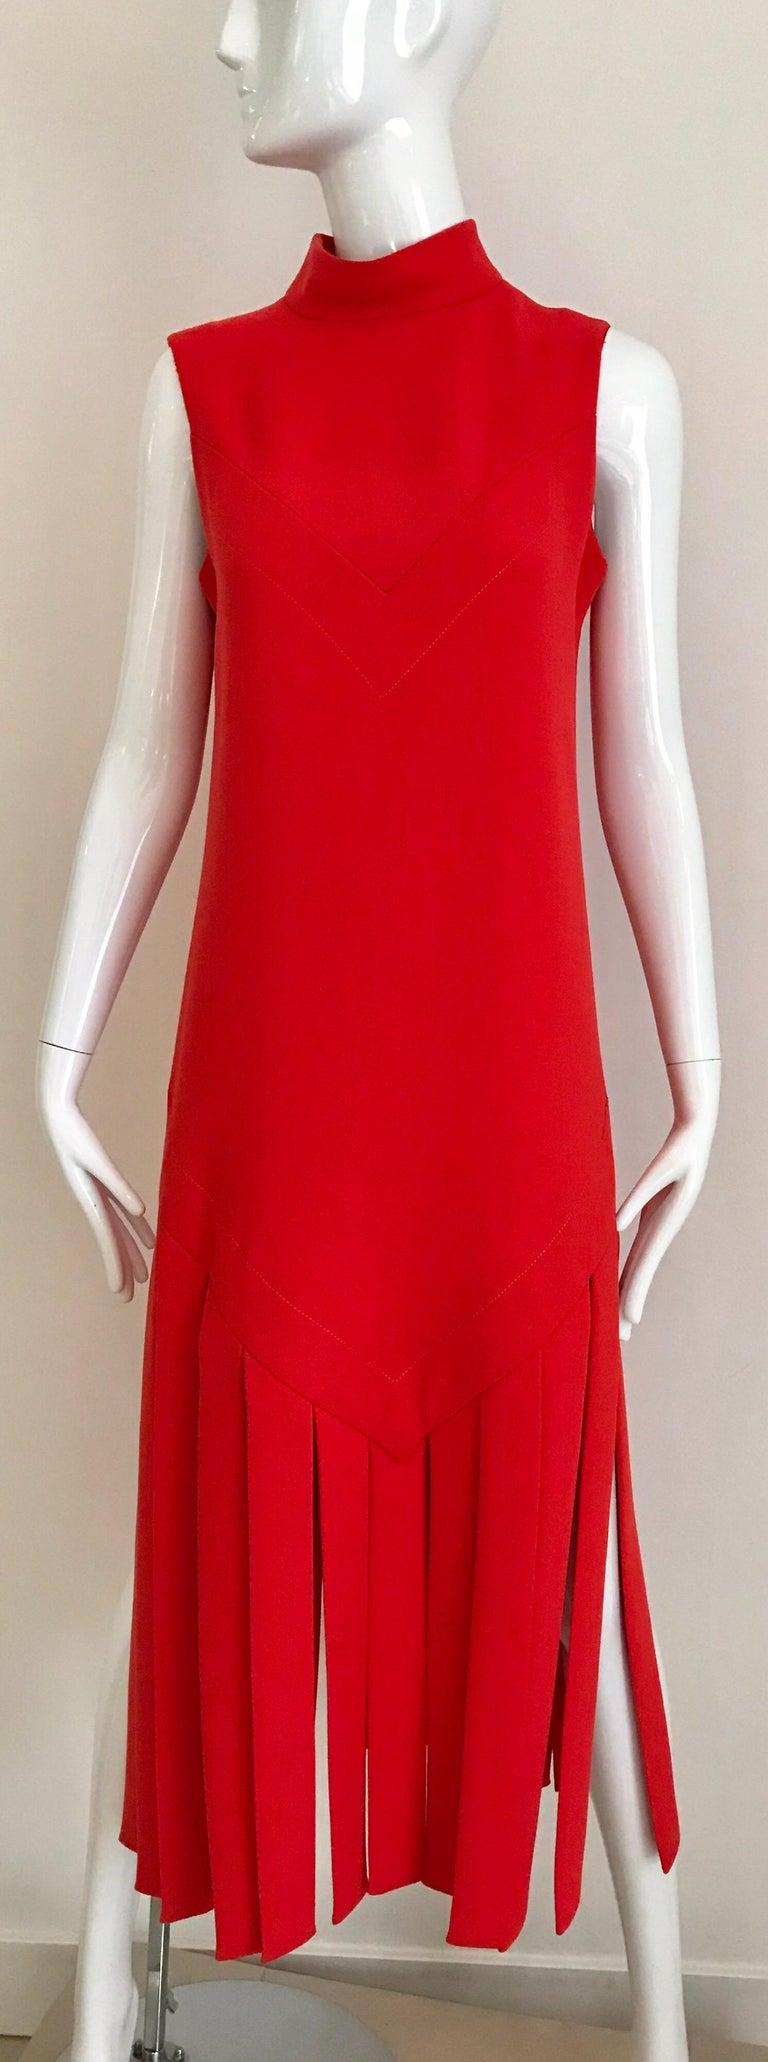 Vintage Pierre Cardin Sleeveless Crepe Dress  For Sale 6